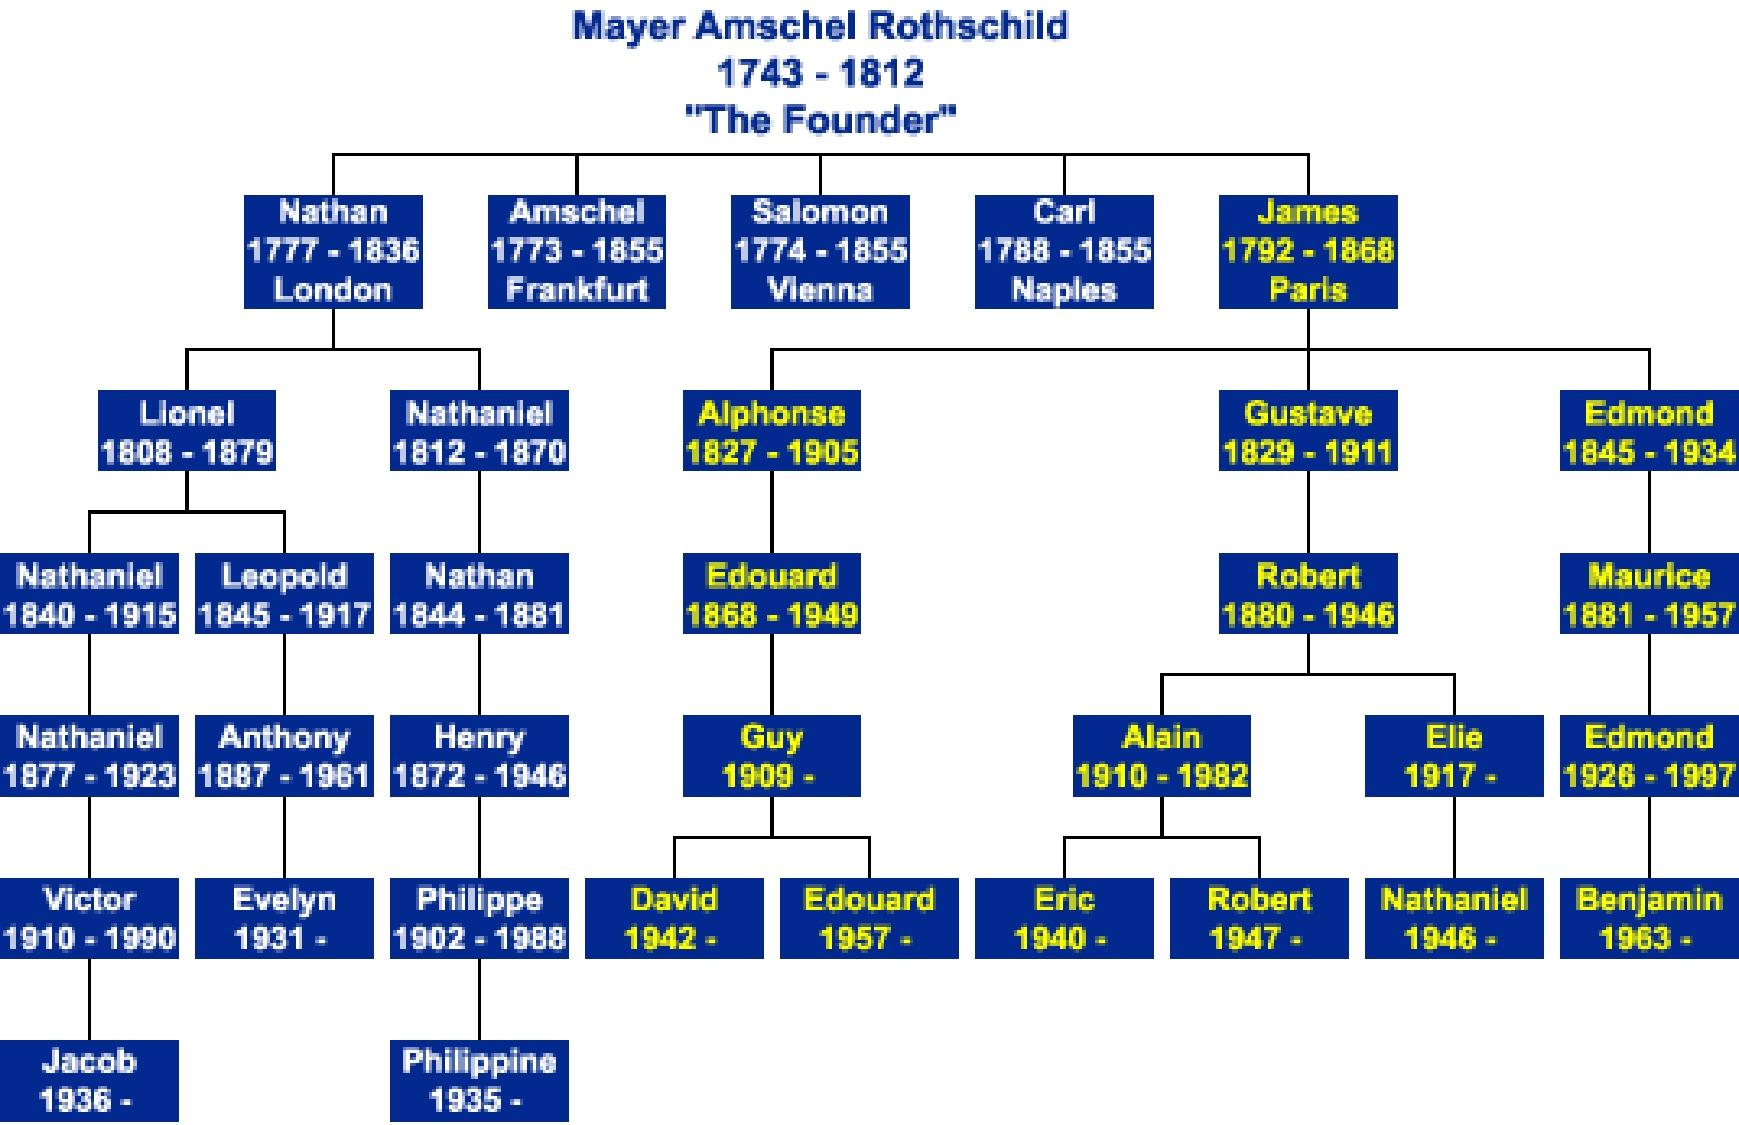 Rothschild family